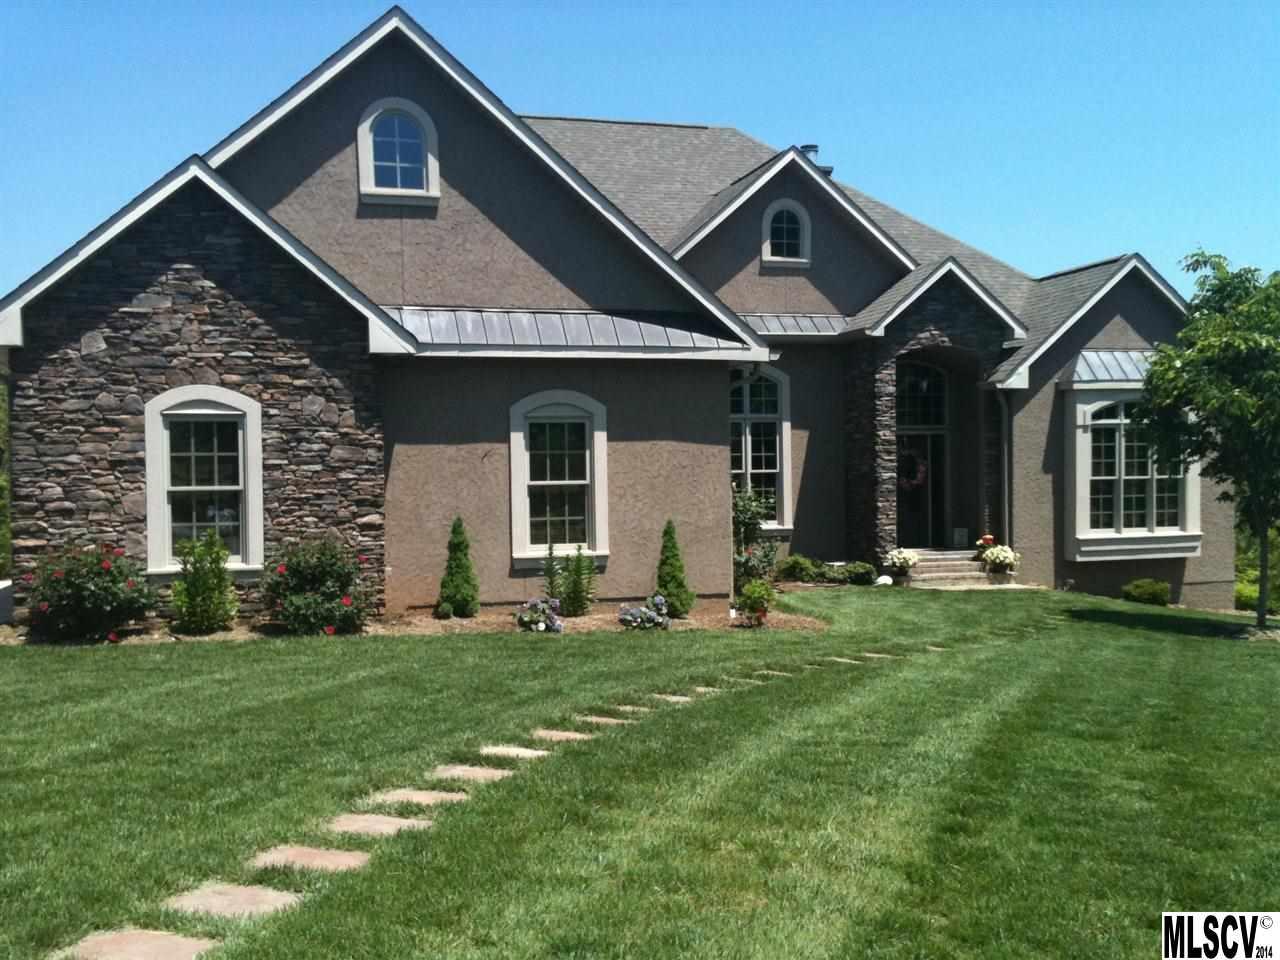 5810 Walnut Grove Ln, Hickory, NC 28602